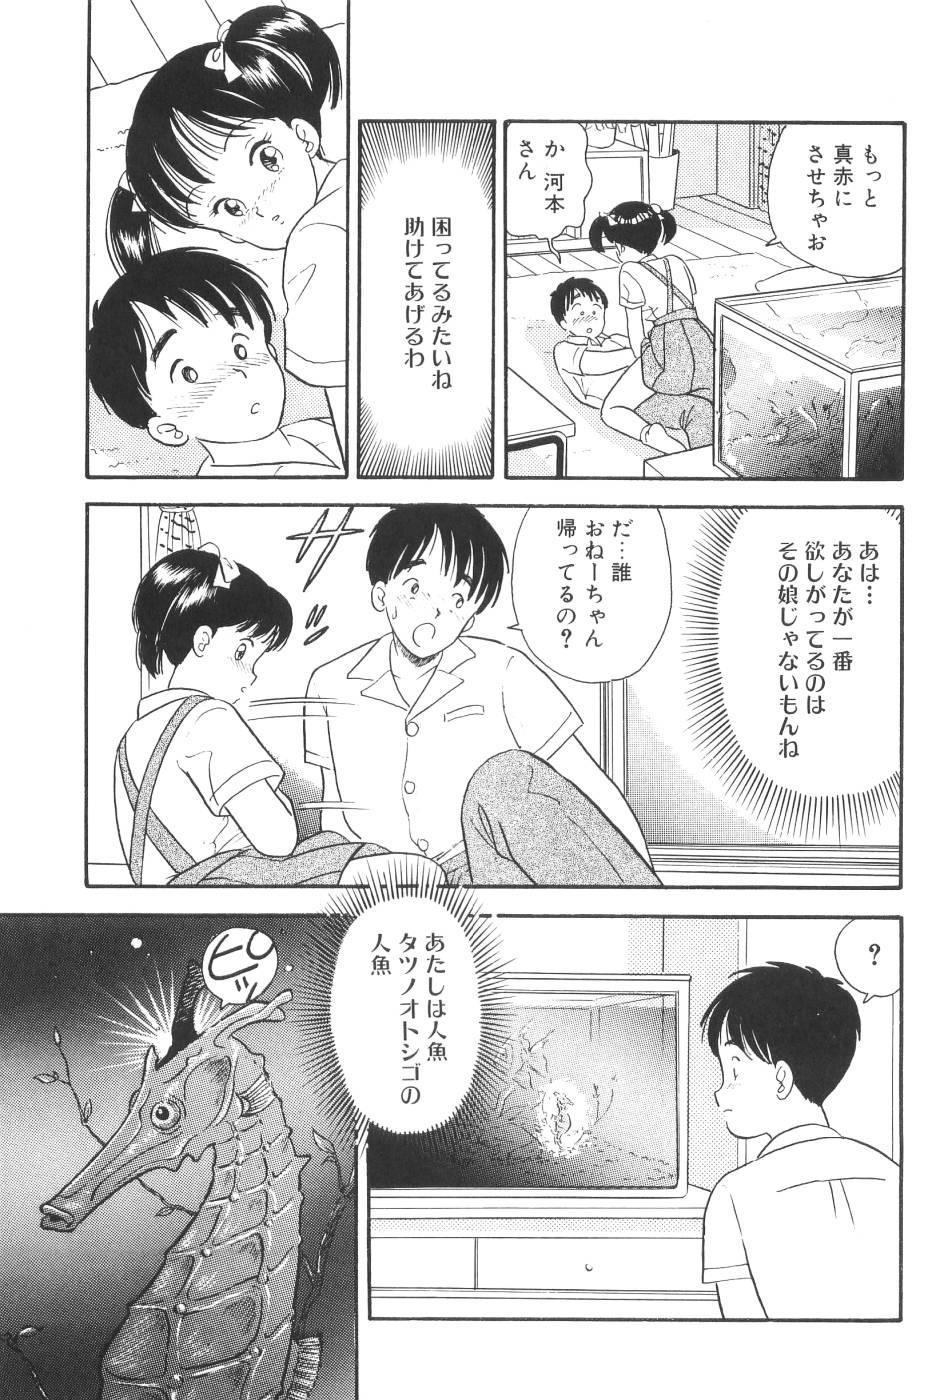 Namioto Densetsu 48